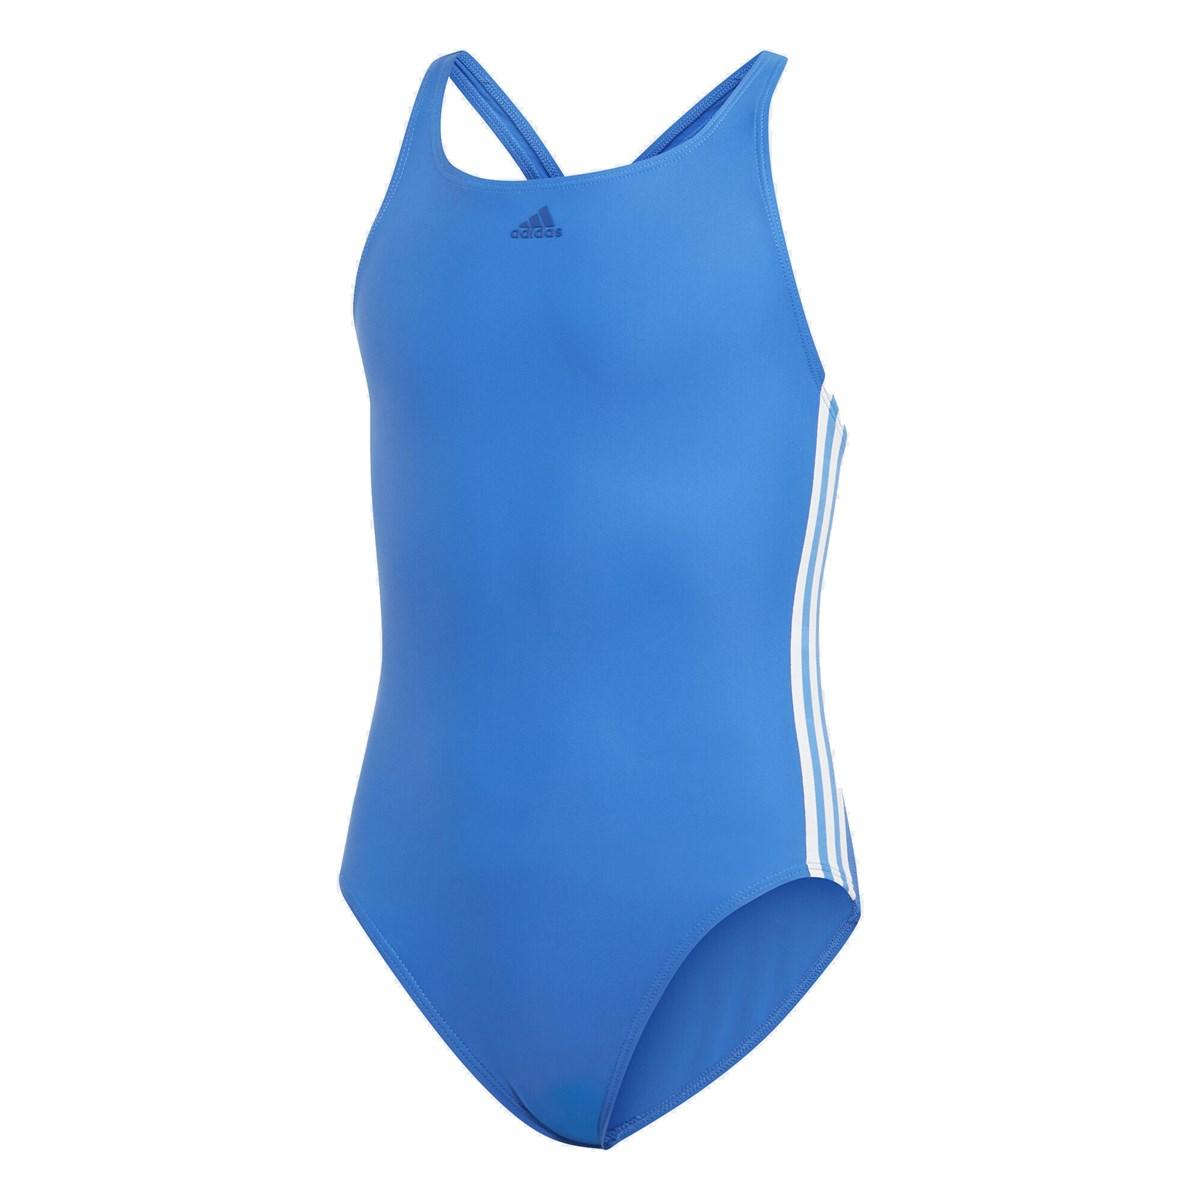 Fit Suit Çocuk Mavi Yüzücü Mayosu (DY5924)